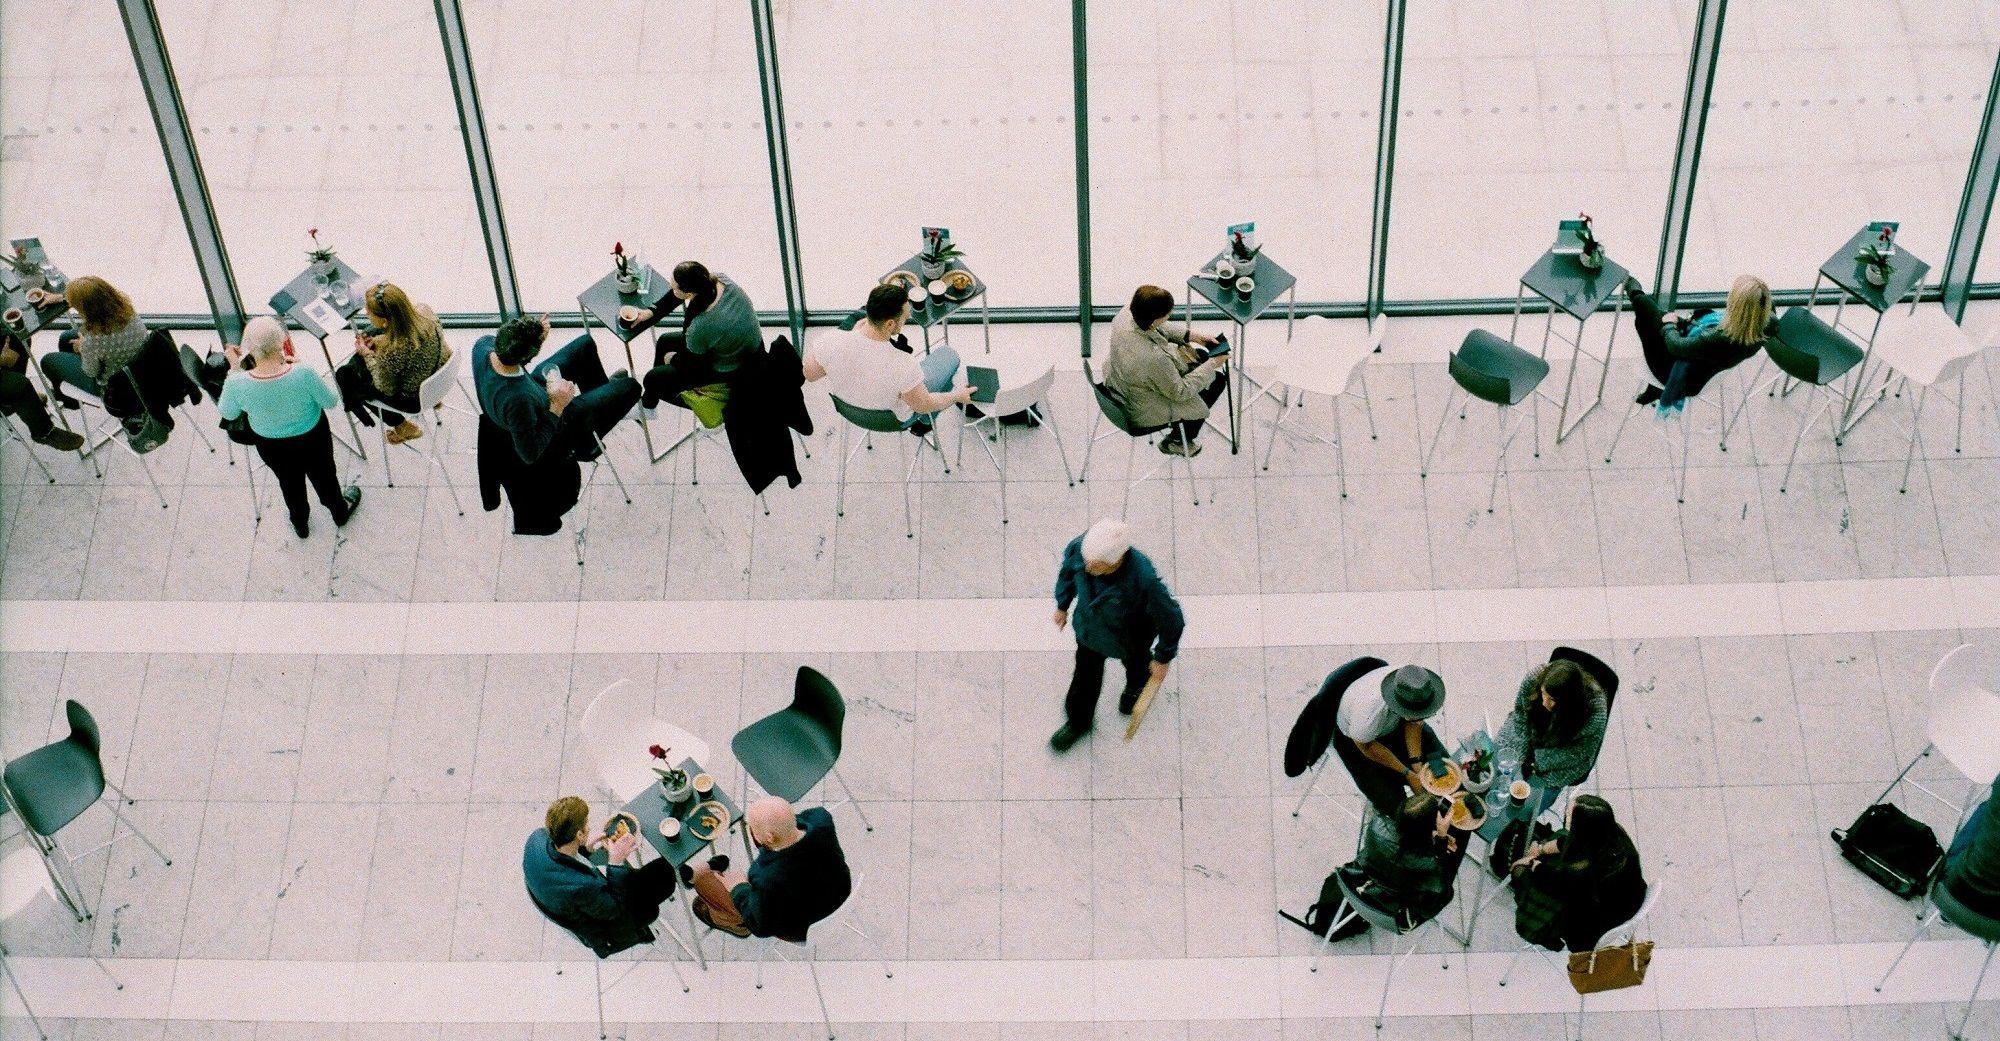 conference_daria-shevtsova-57340 (003).jpg